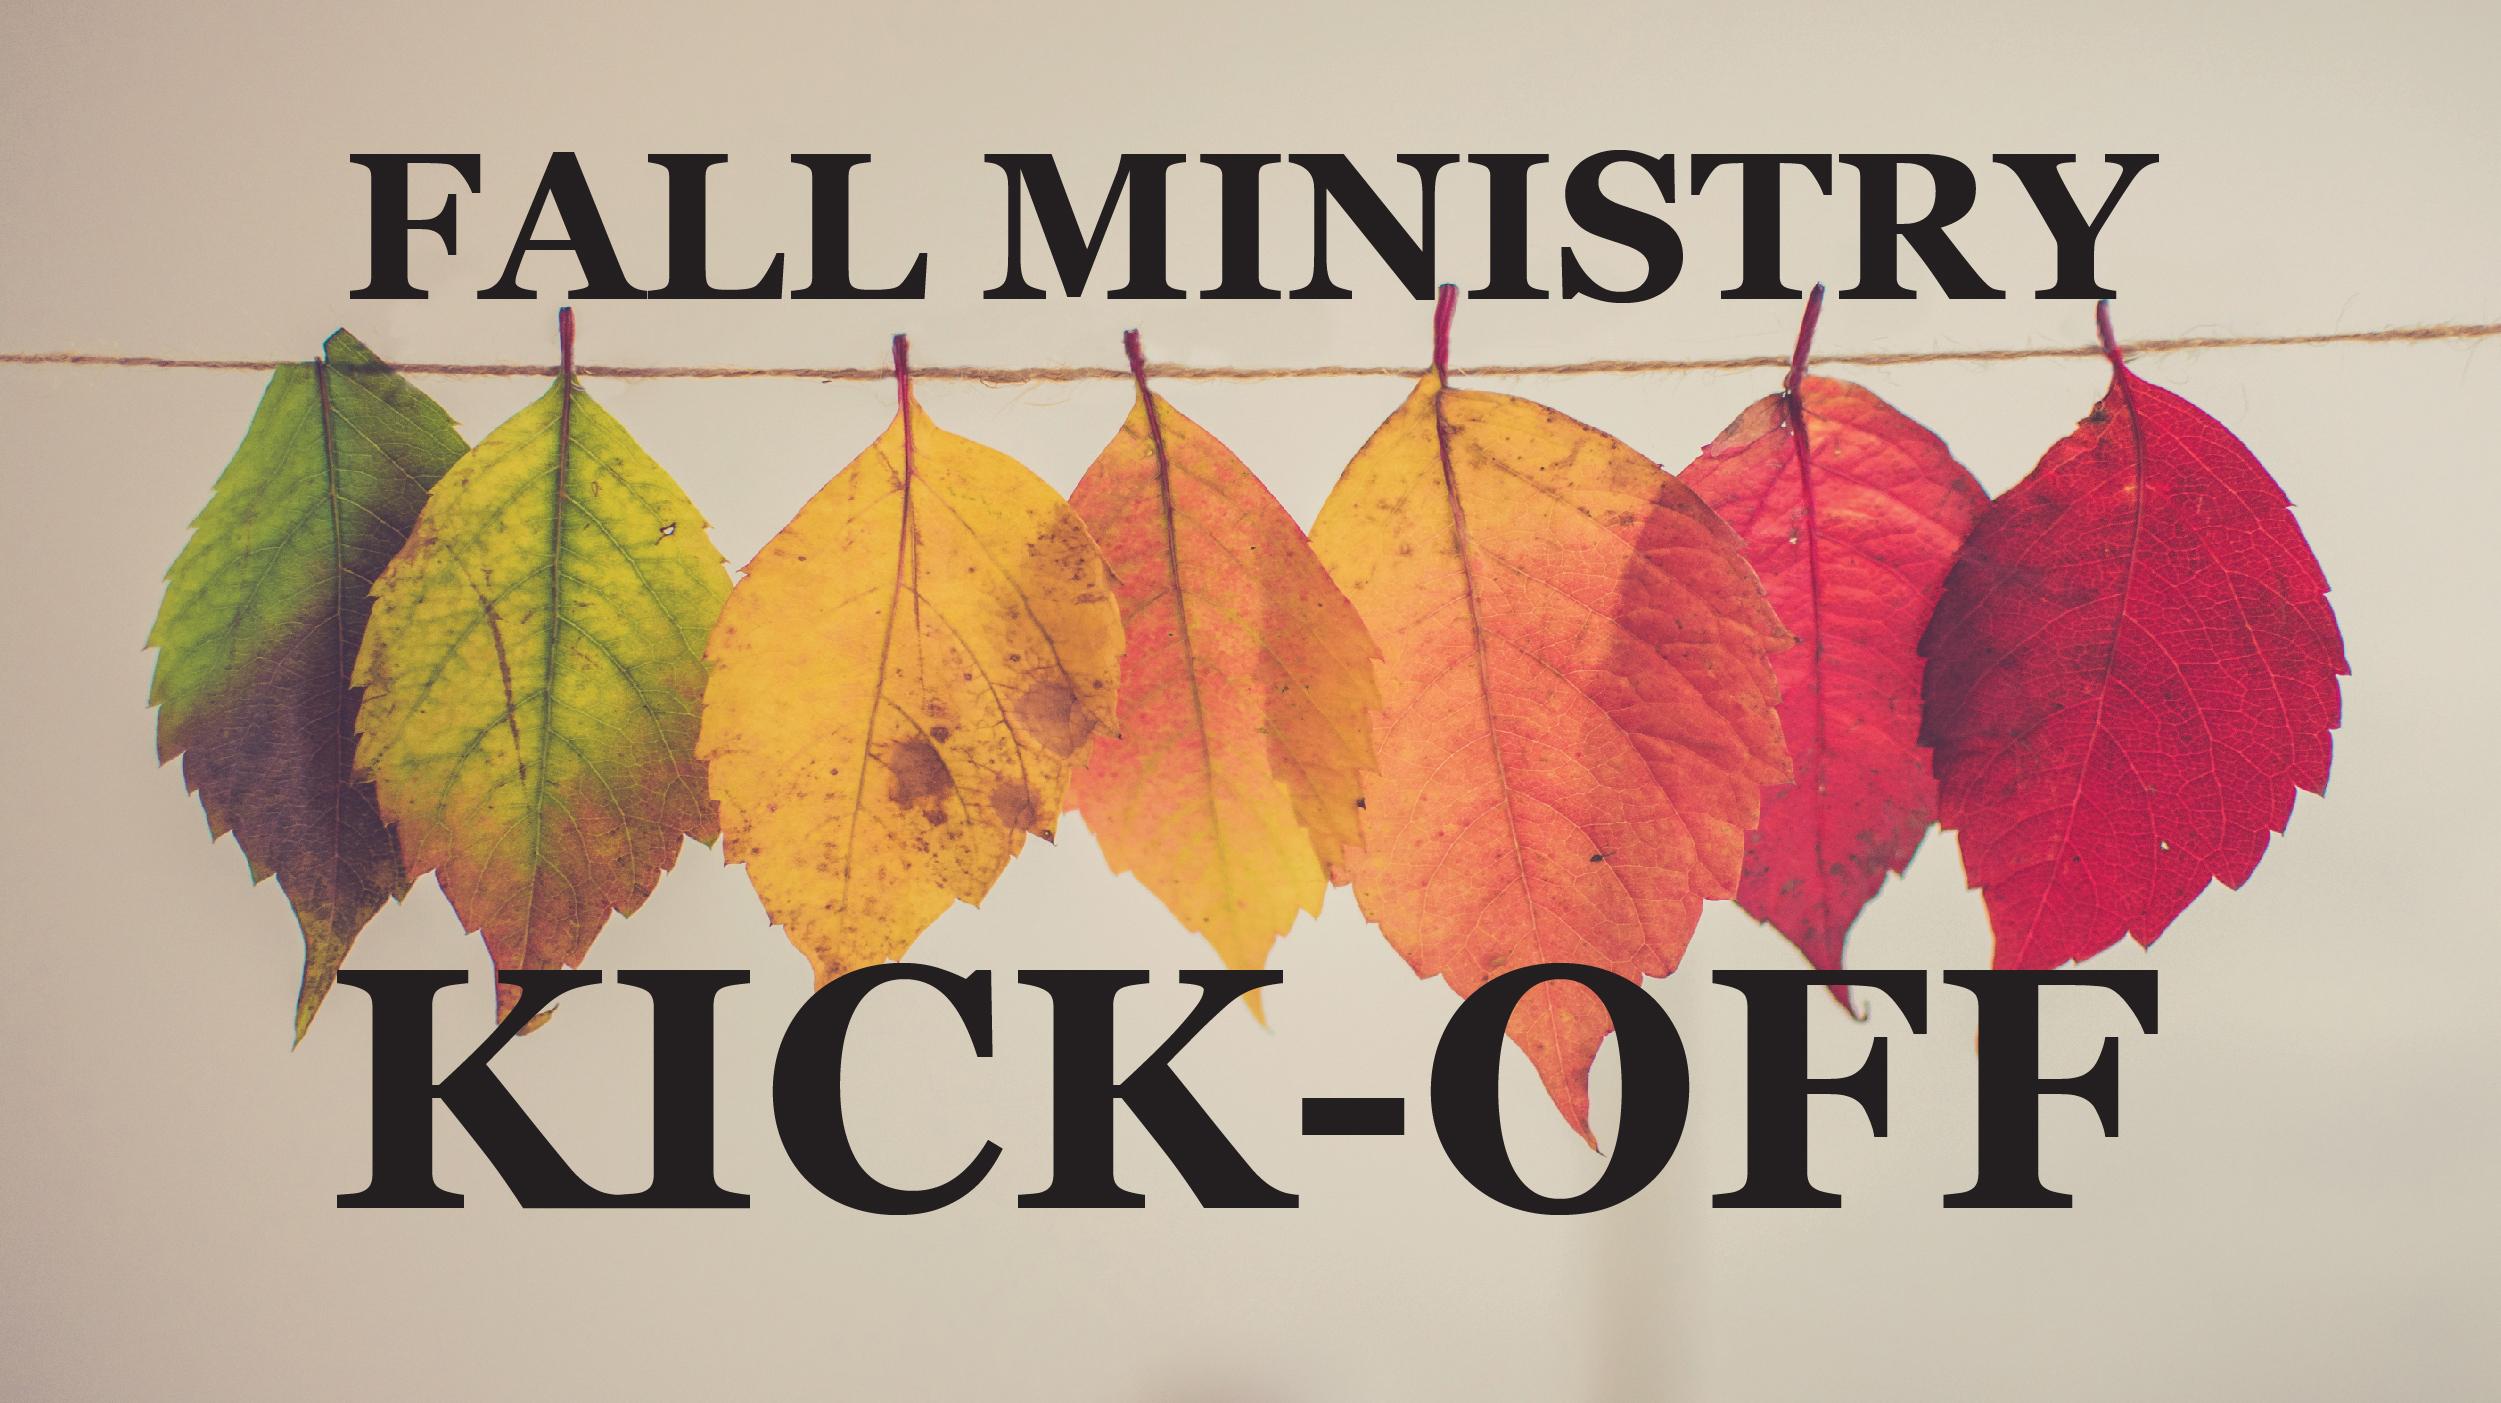 nh ministry kick off